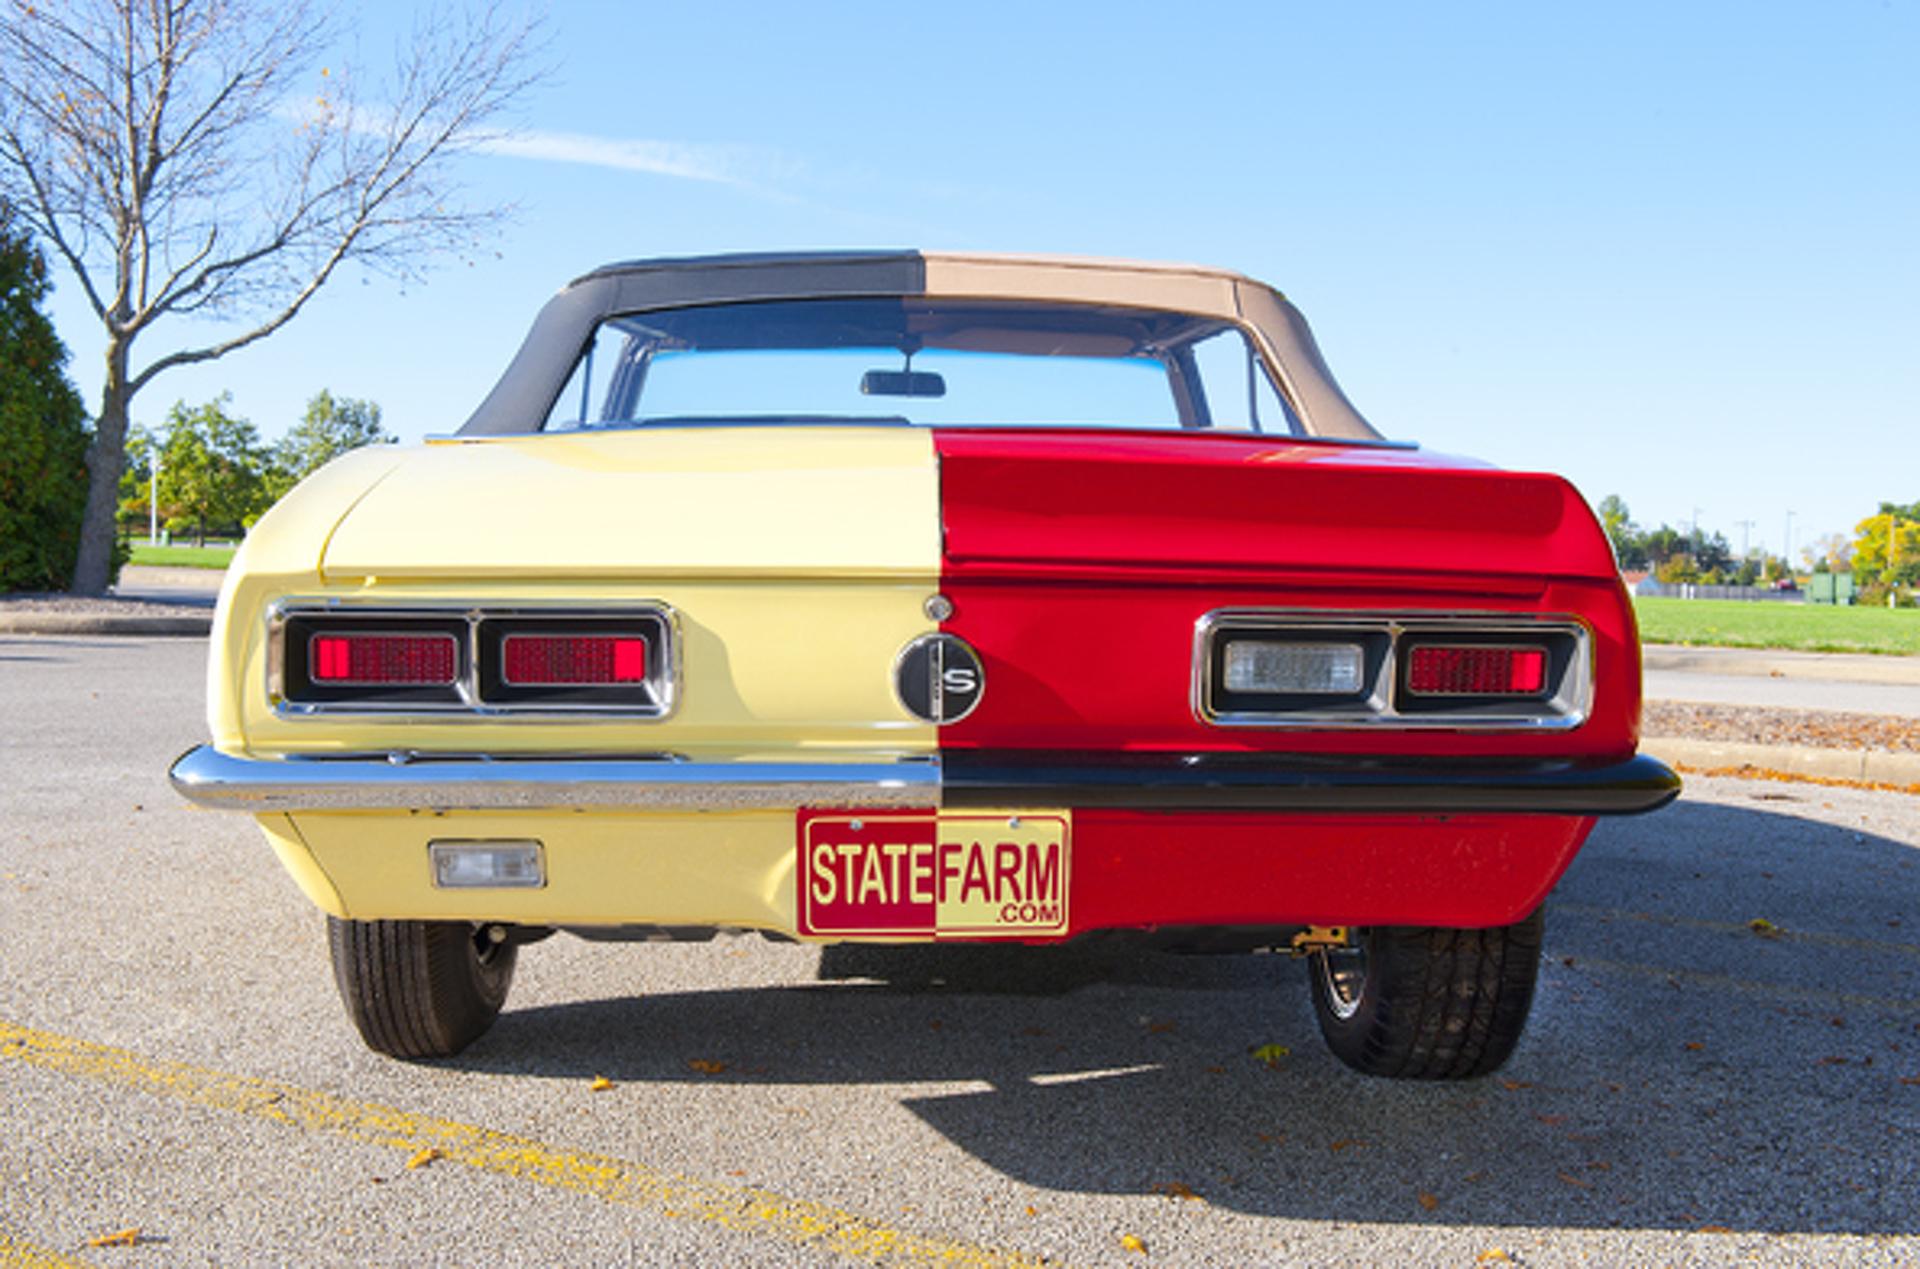 State Farm Asks: How Do You Like Your Camaro?